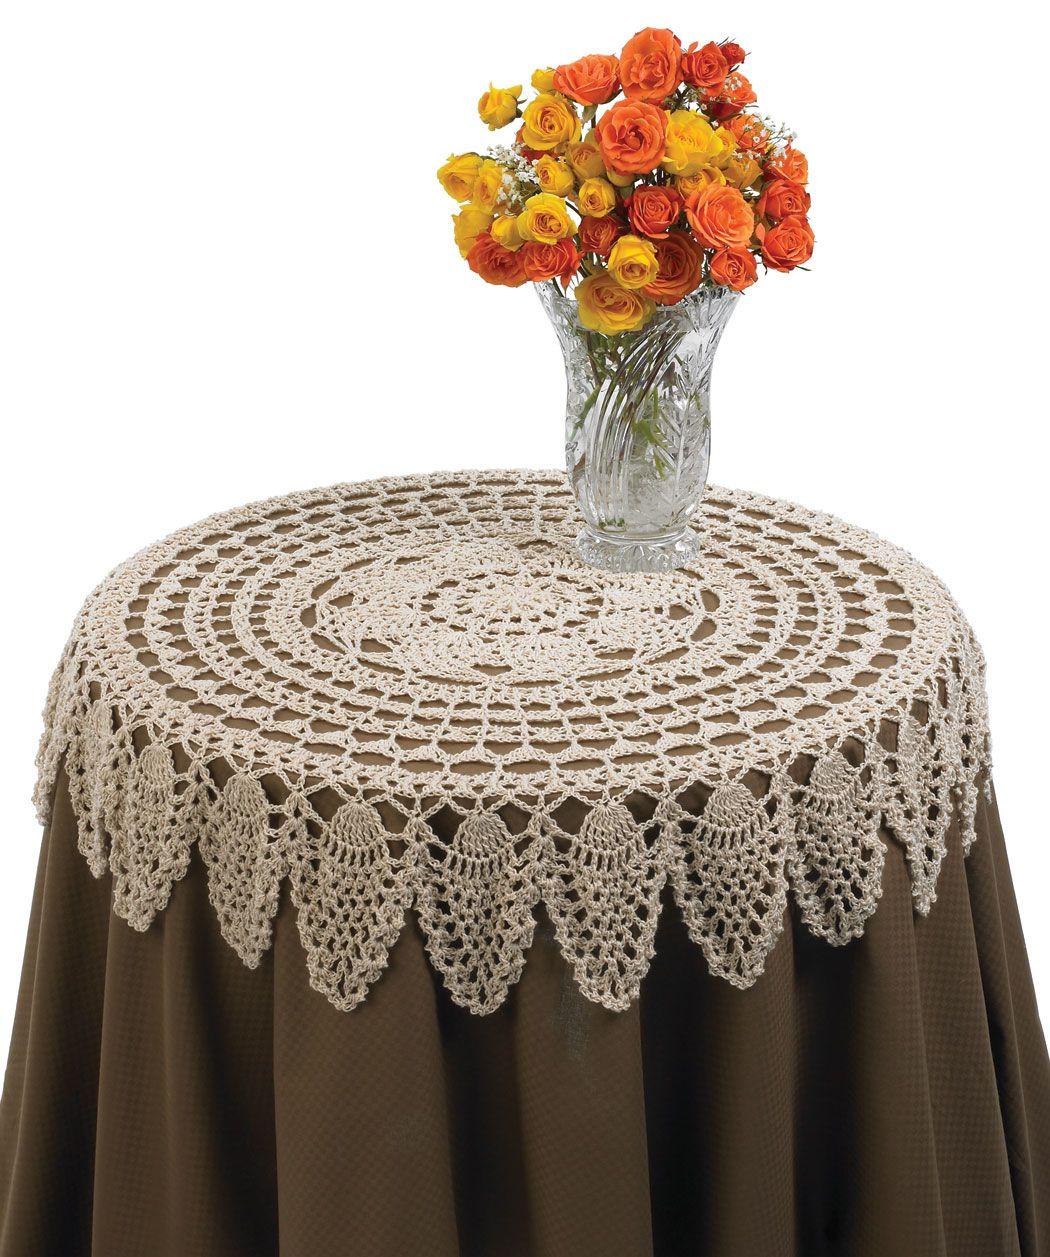 Table Topper: free pattern | Biodiversidad | Pinterest | Mantel ...